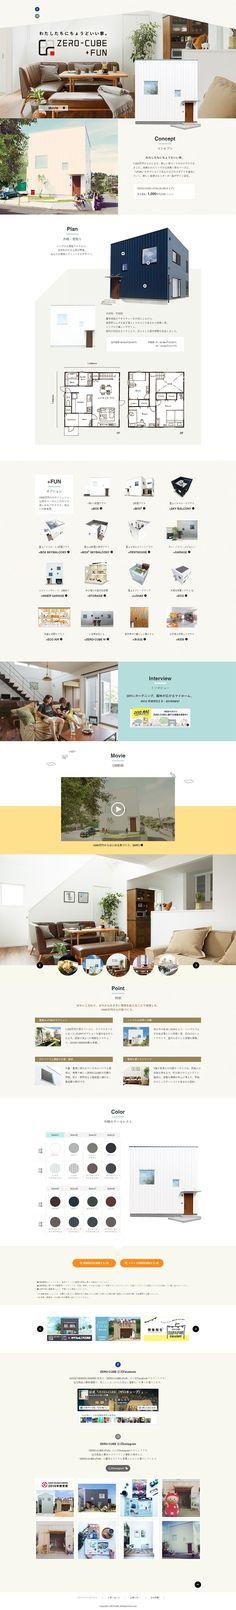 ZERO-CUBE +FUN【不動産関連】のLPデザイン。WEBデザイナーさん必見!ランディングページのデザイン参考に(シンプル系)